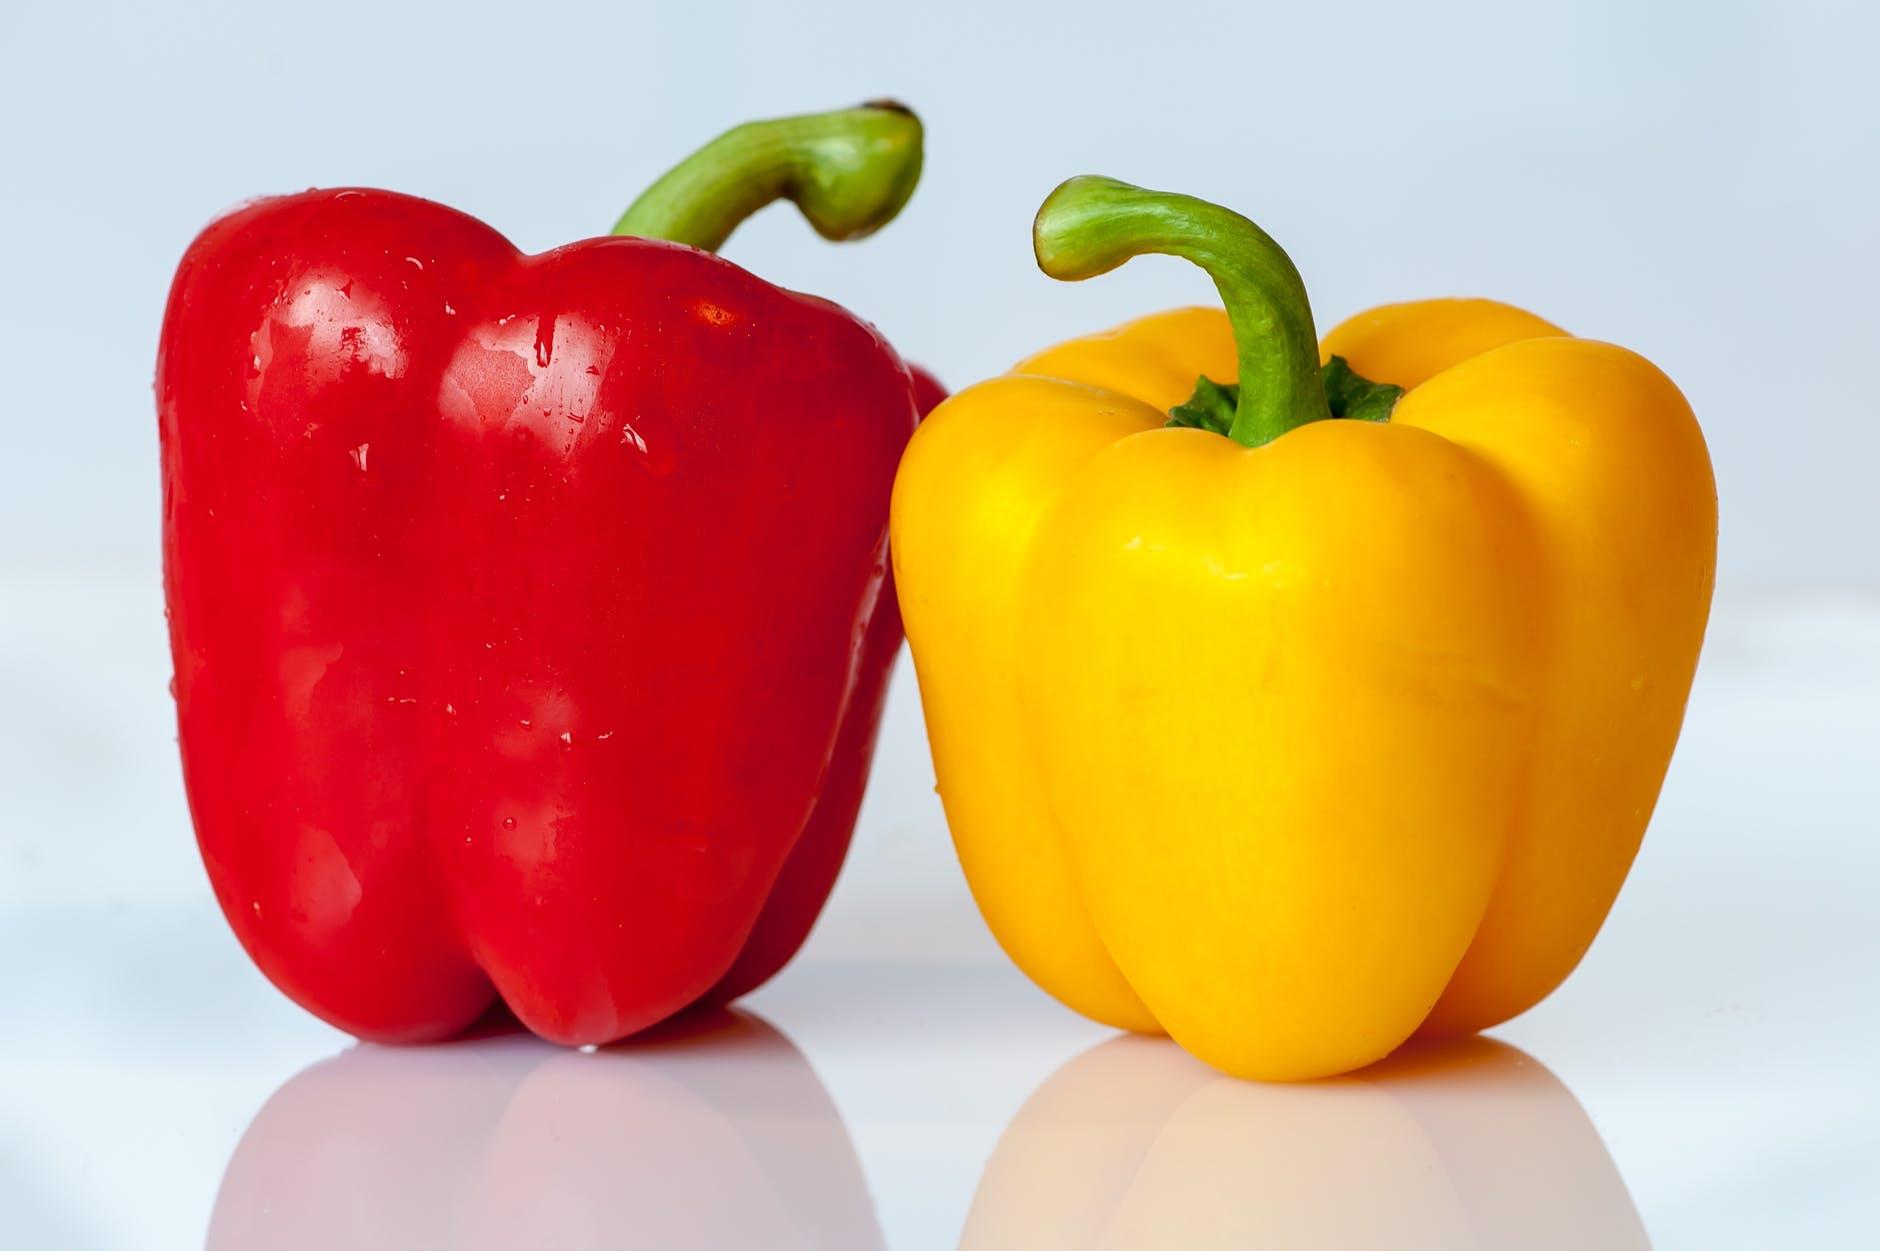 paprika-vegetables-yellow-red-53107.jpeg